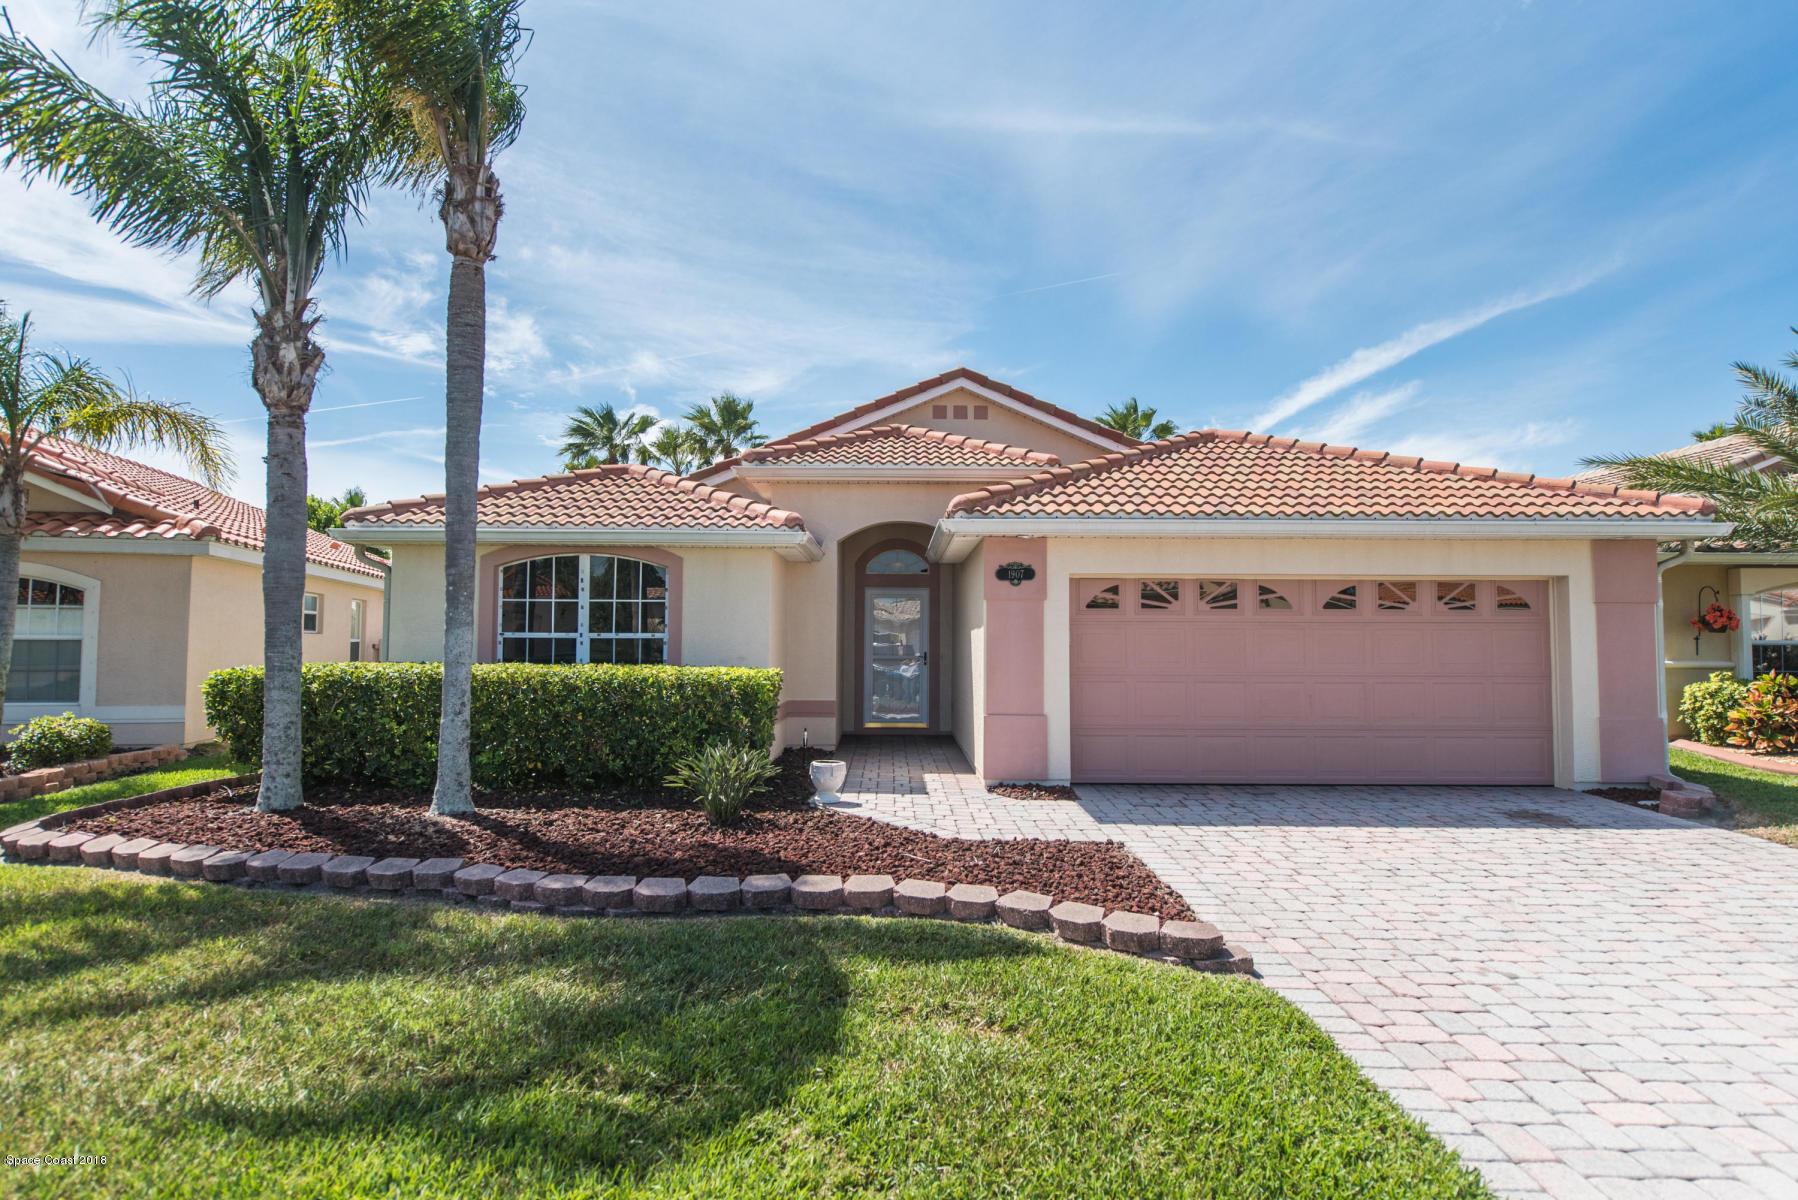 Property for Sale at 1907 Cavendish 1907 Cavendish Viera, Florida 32955 United States